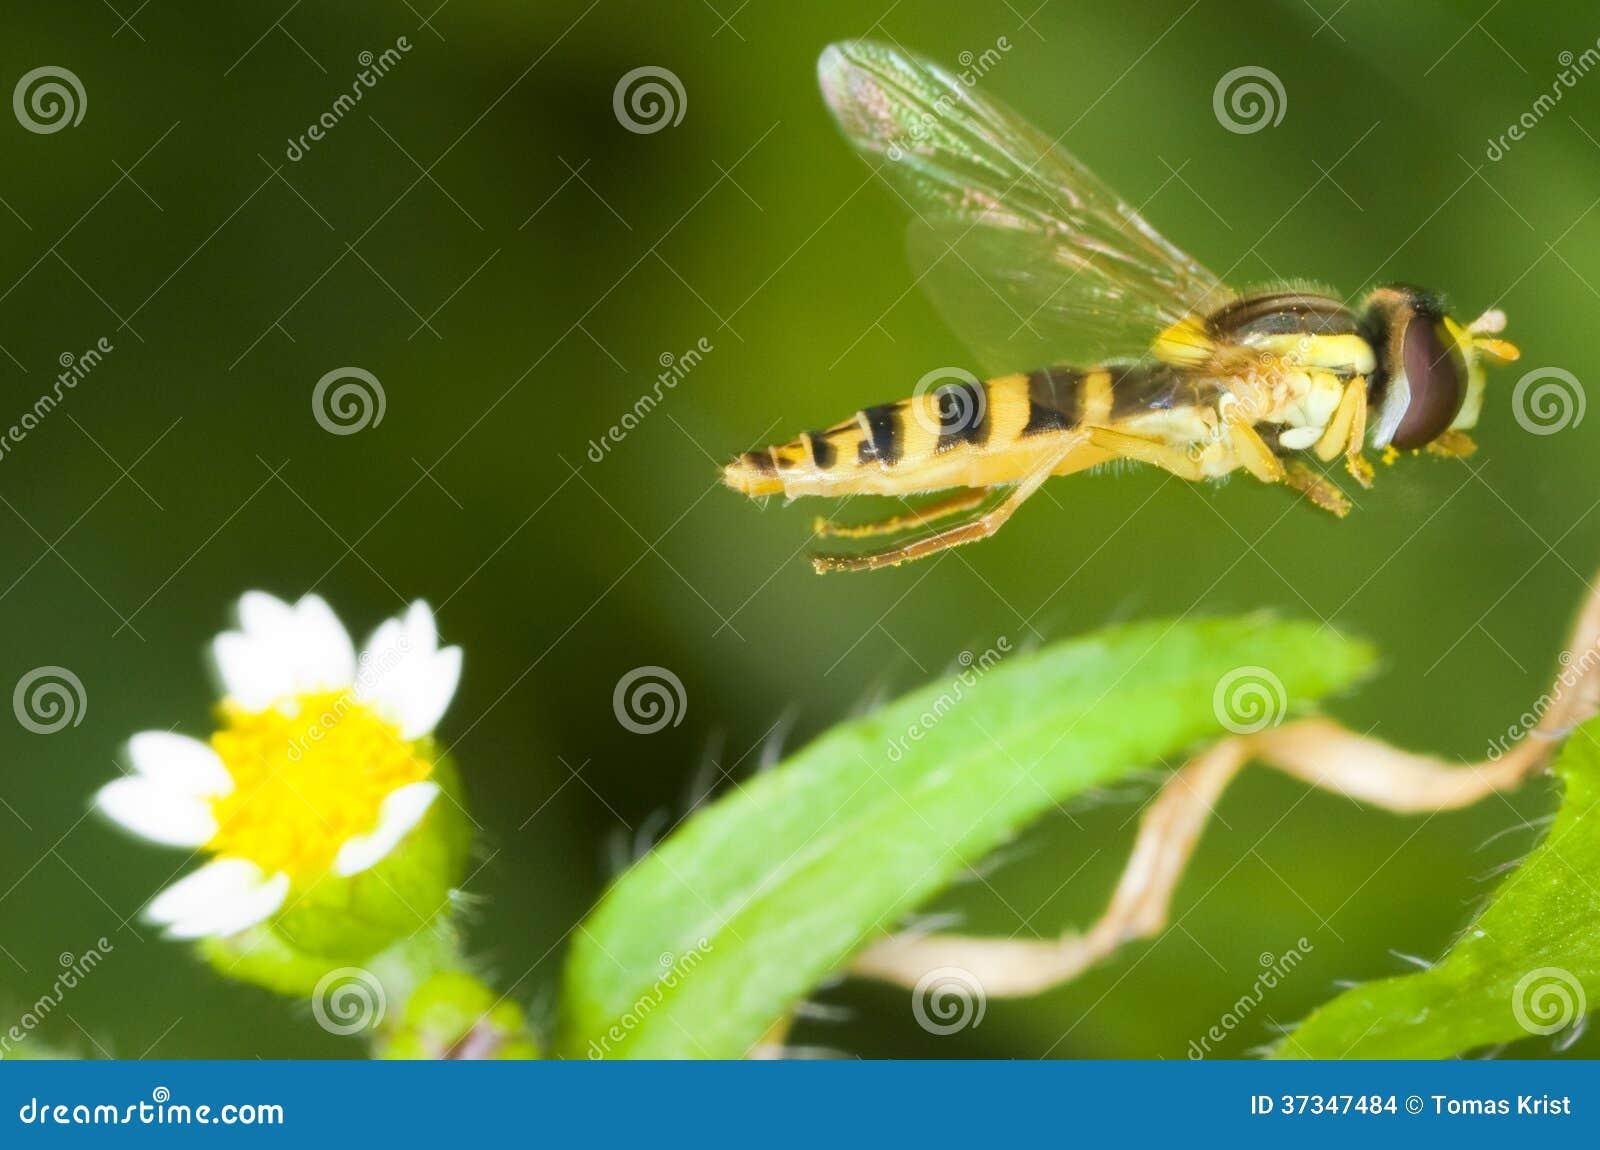 Syrphus ribesii hoverfly